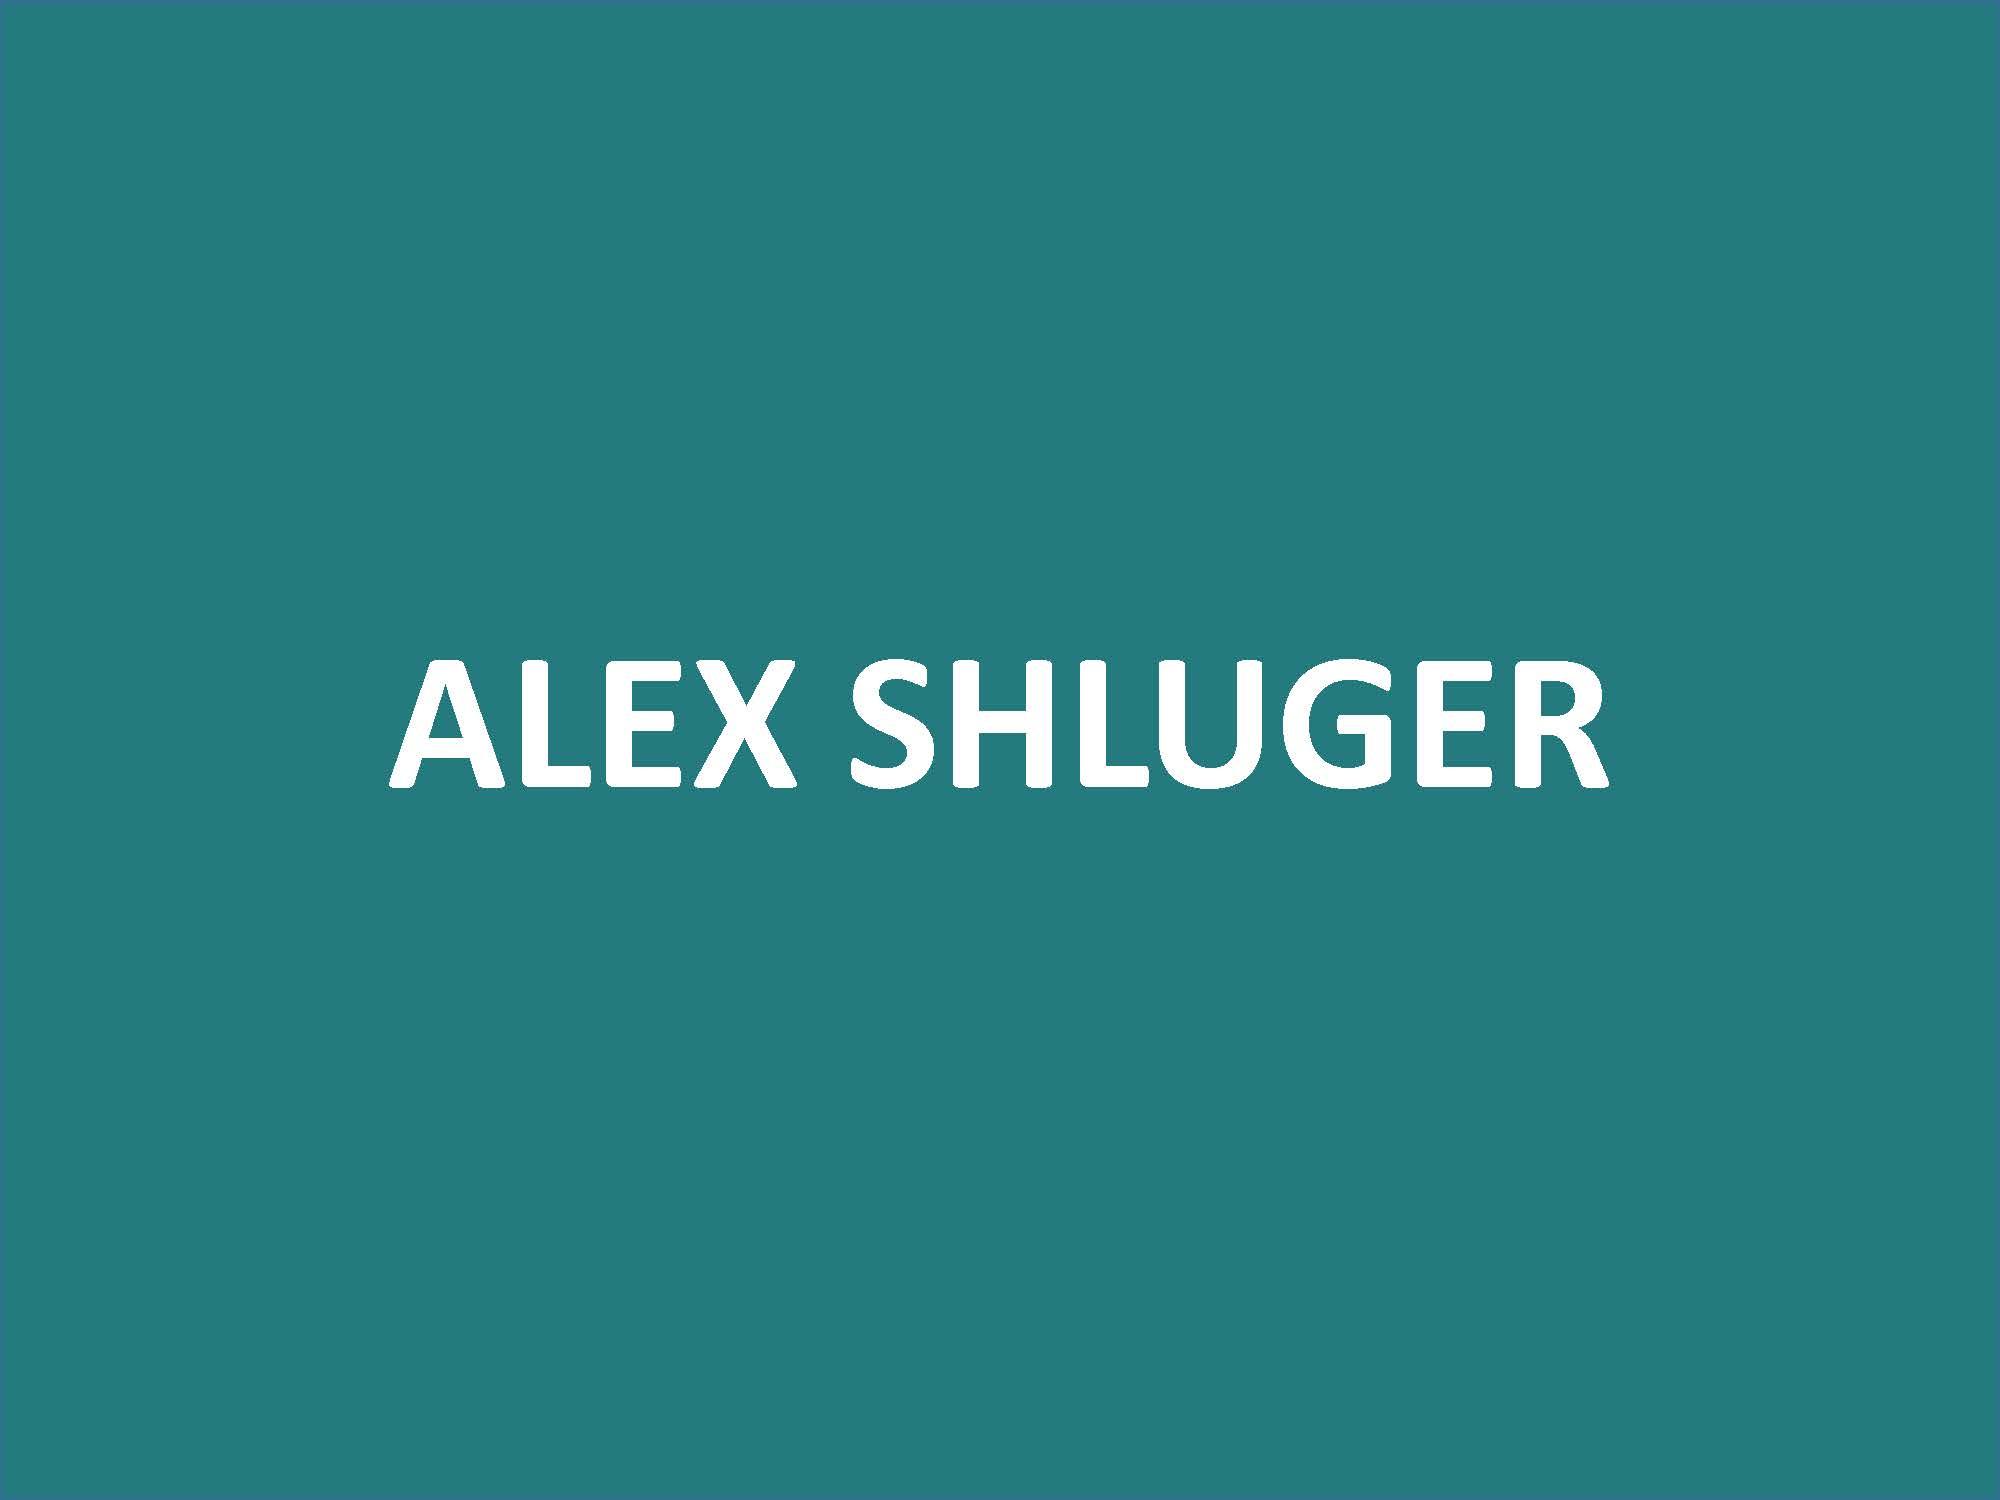 Alex Shluger